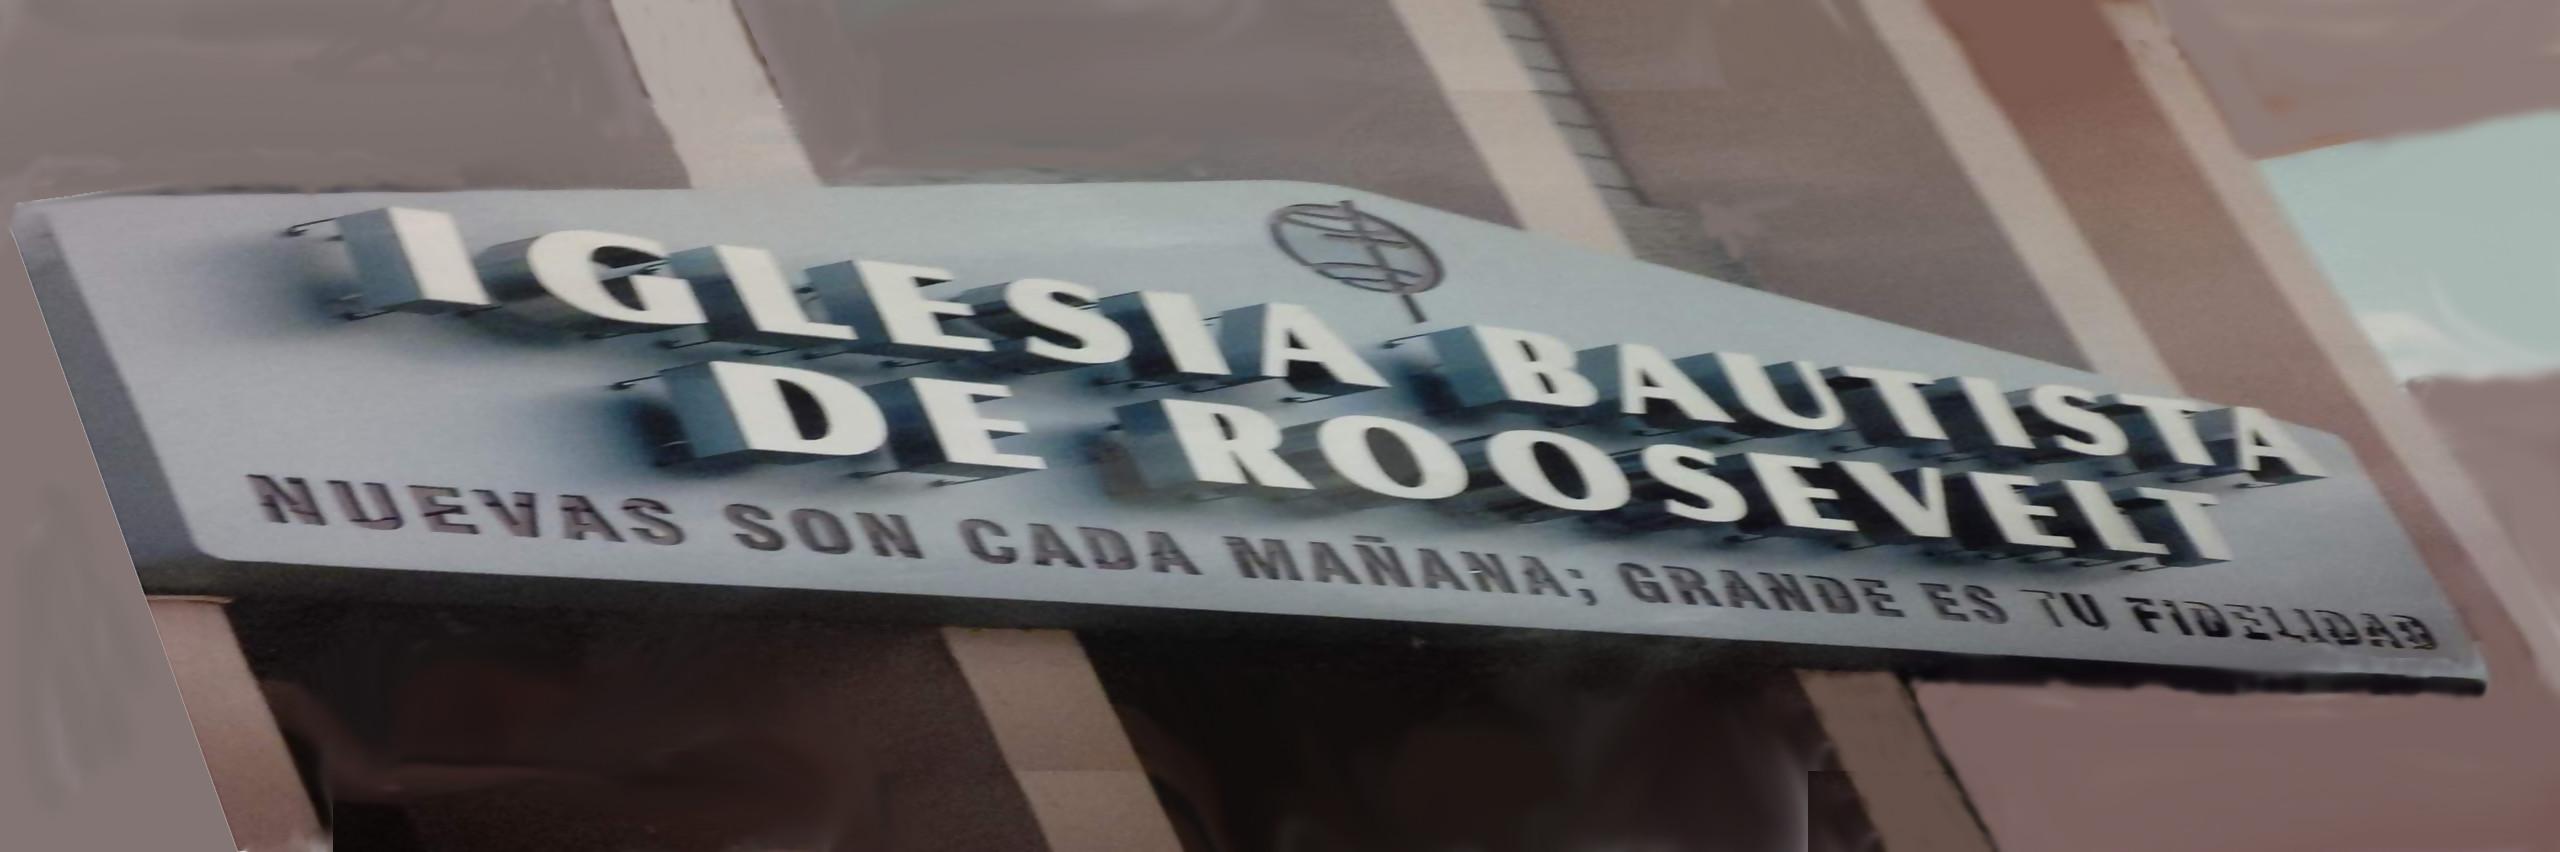 Iglesia Bautista de Roosevelt